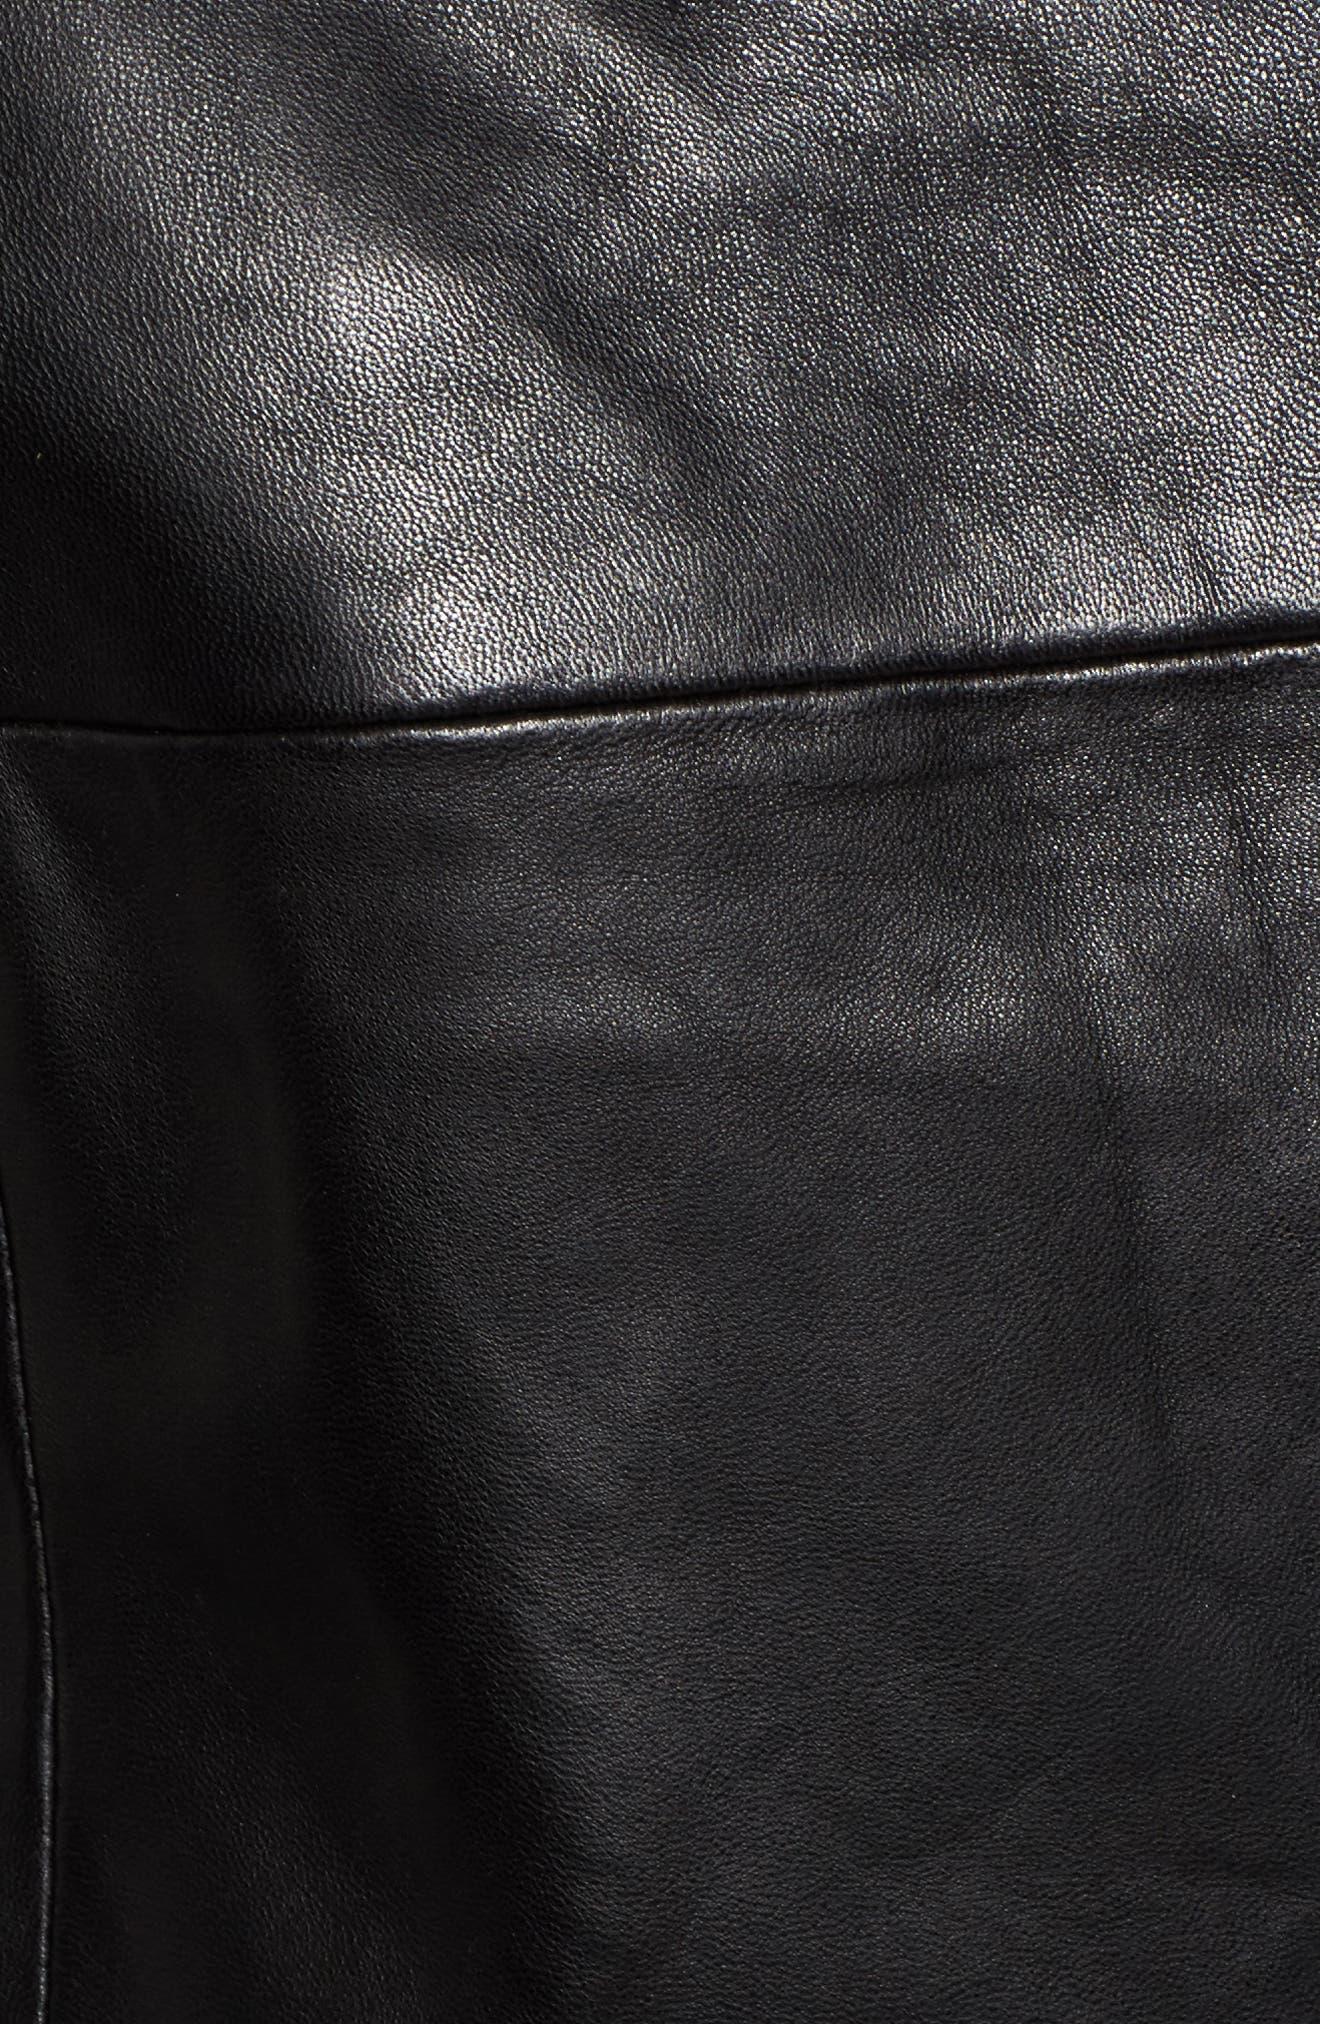 Belted Leather Moto Jacket,                             Alternate thumbnail 6, color,